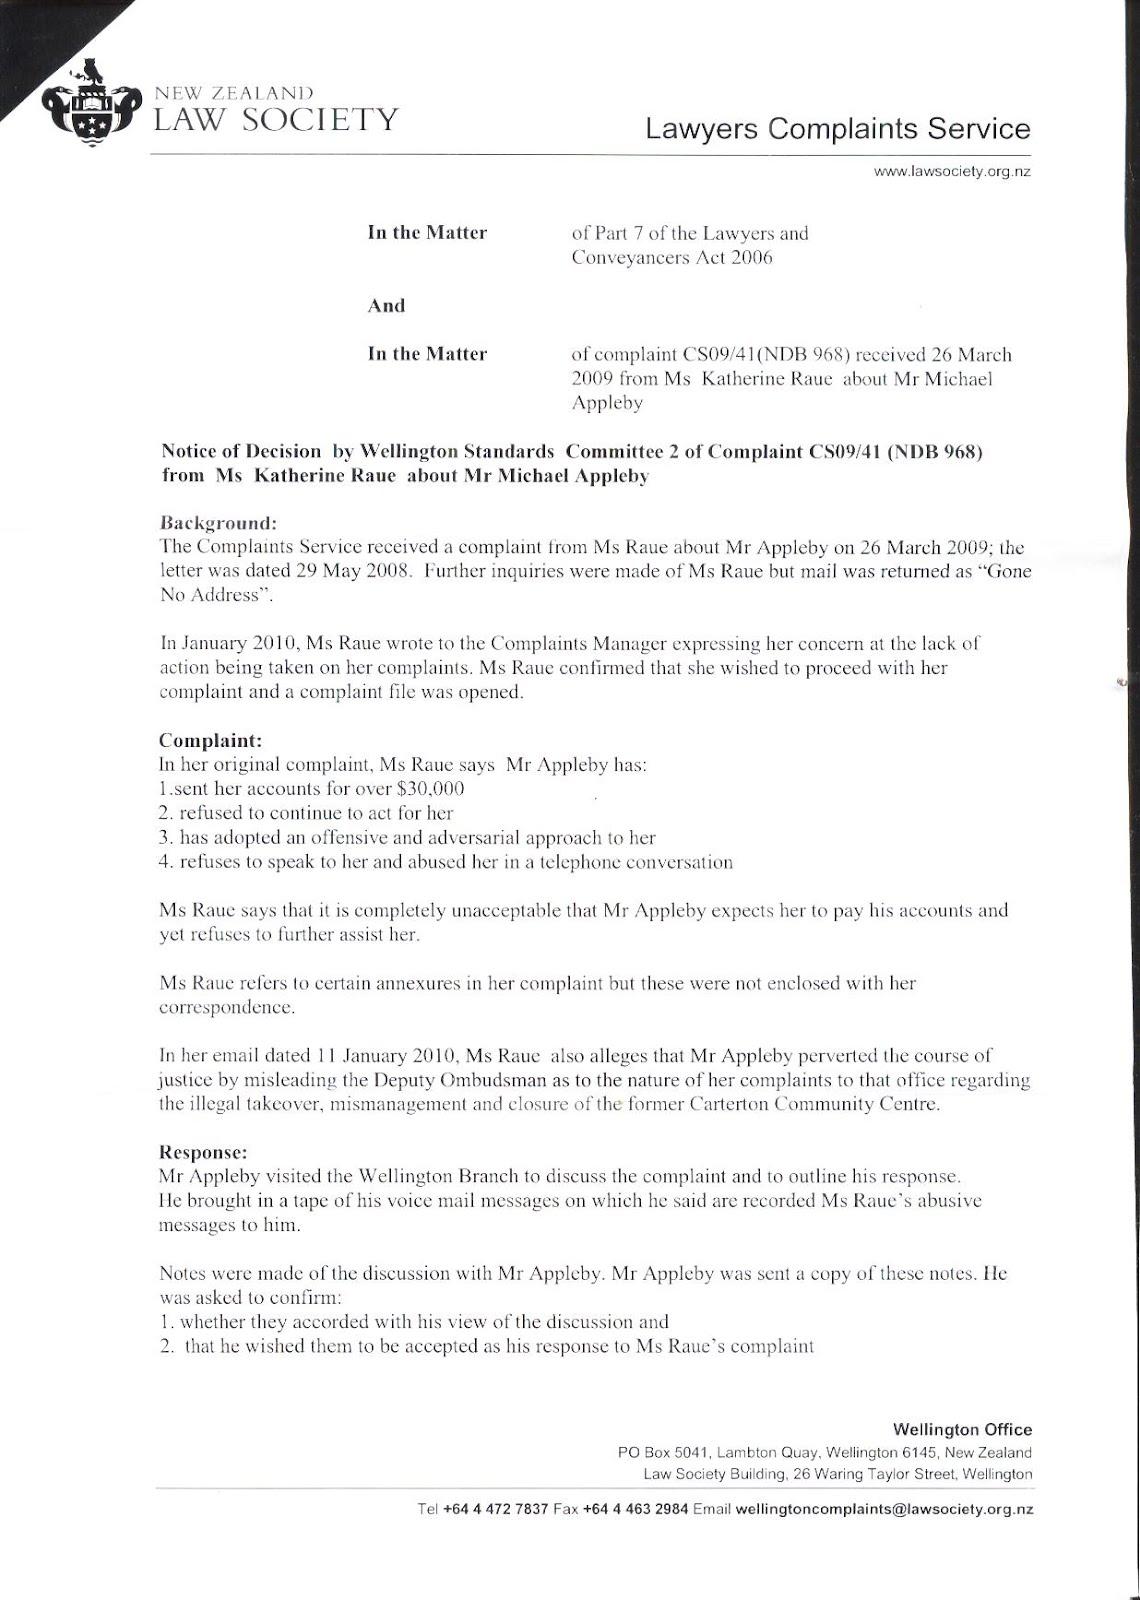 Transparency nz december 2010 lawyer michael applebys friend julian tyerman responds to law society complaint spiritdancerdesigns Image collections